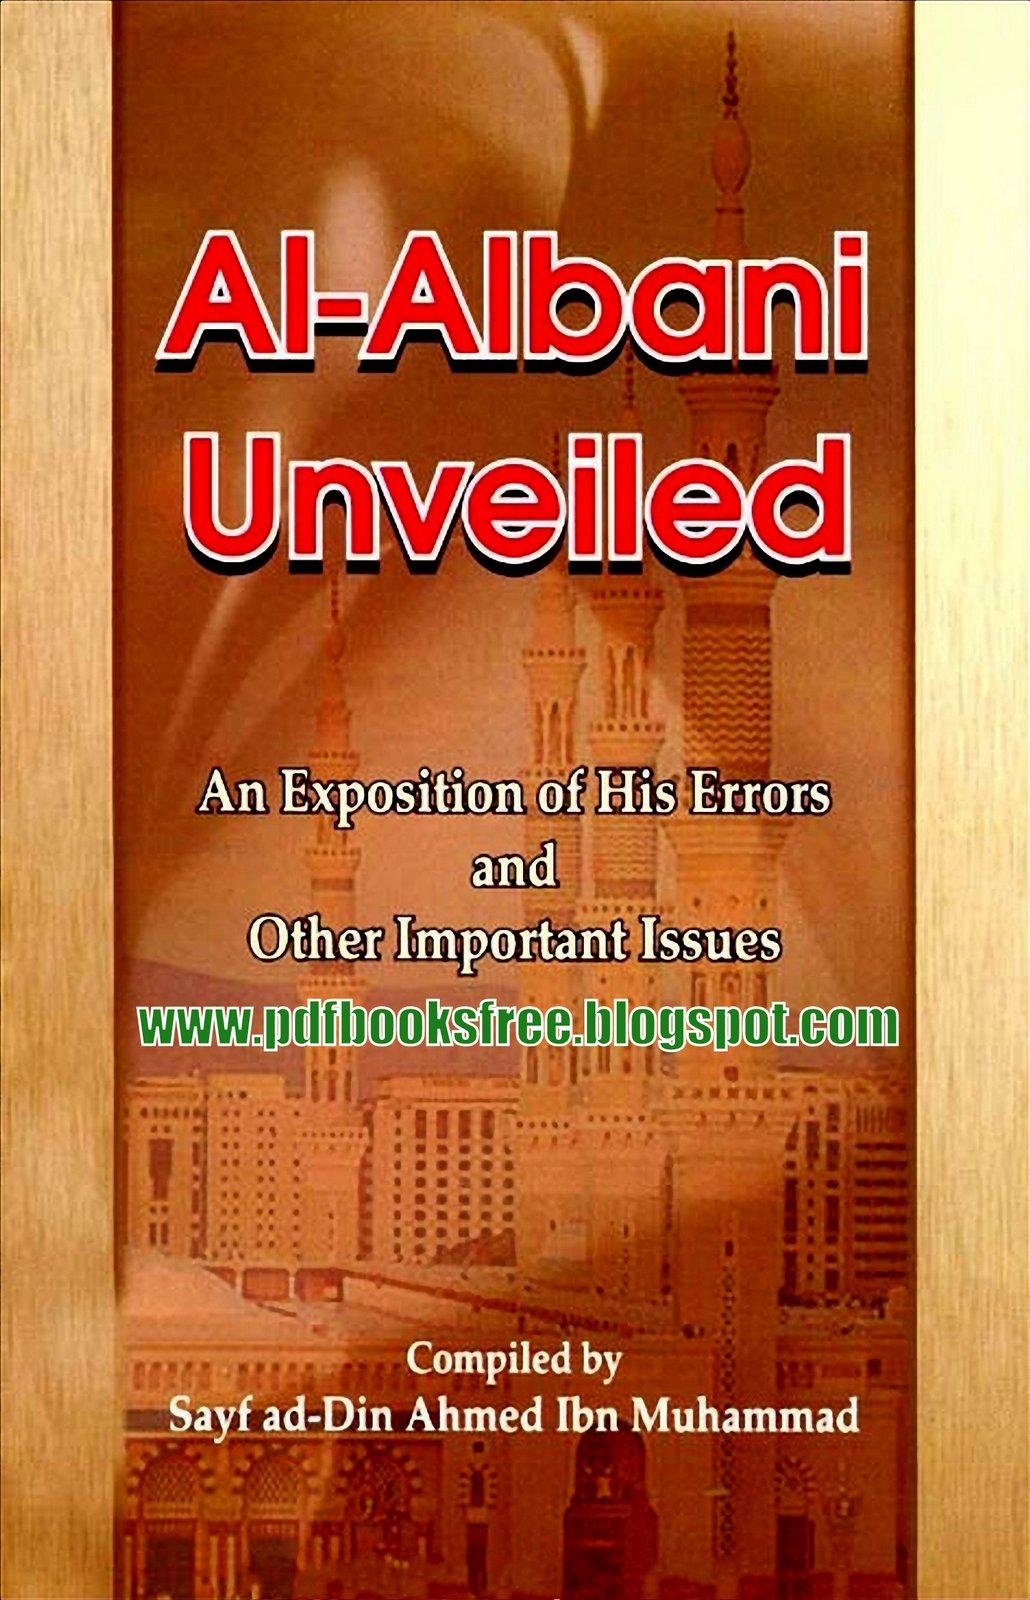 Books pdf albani